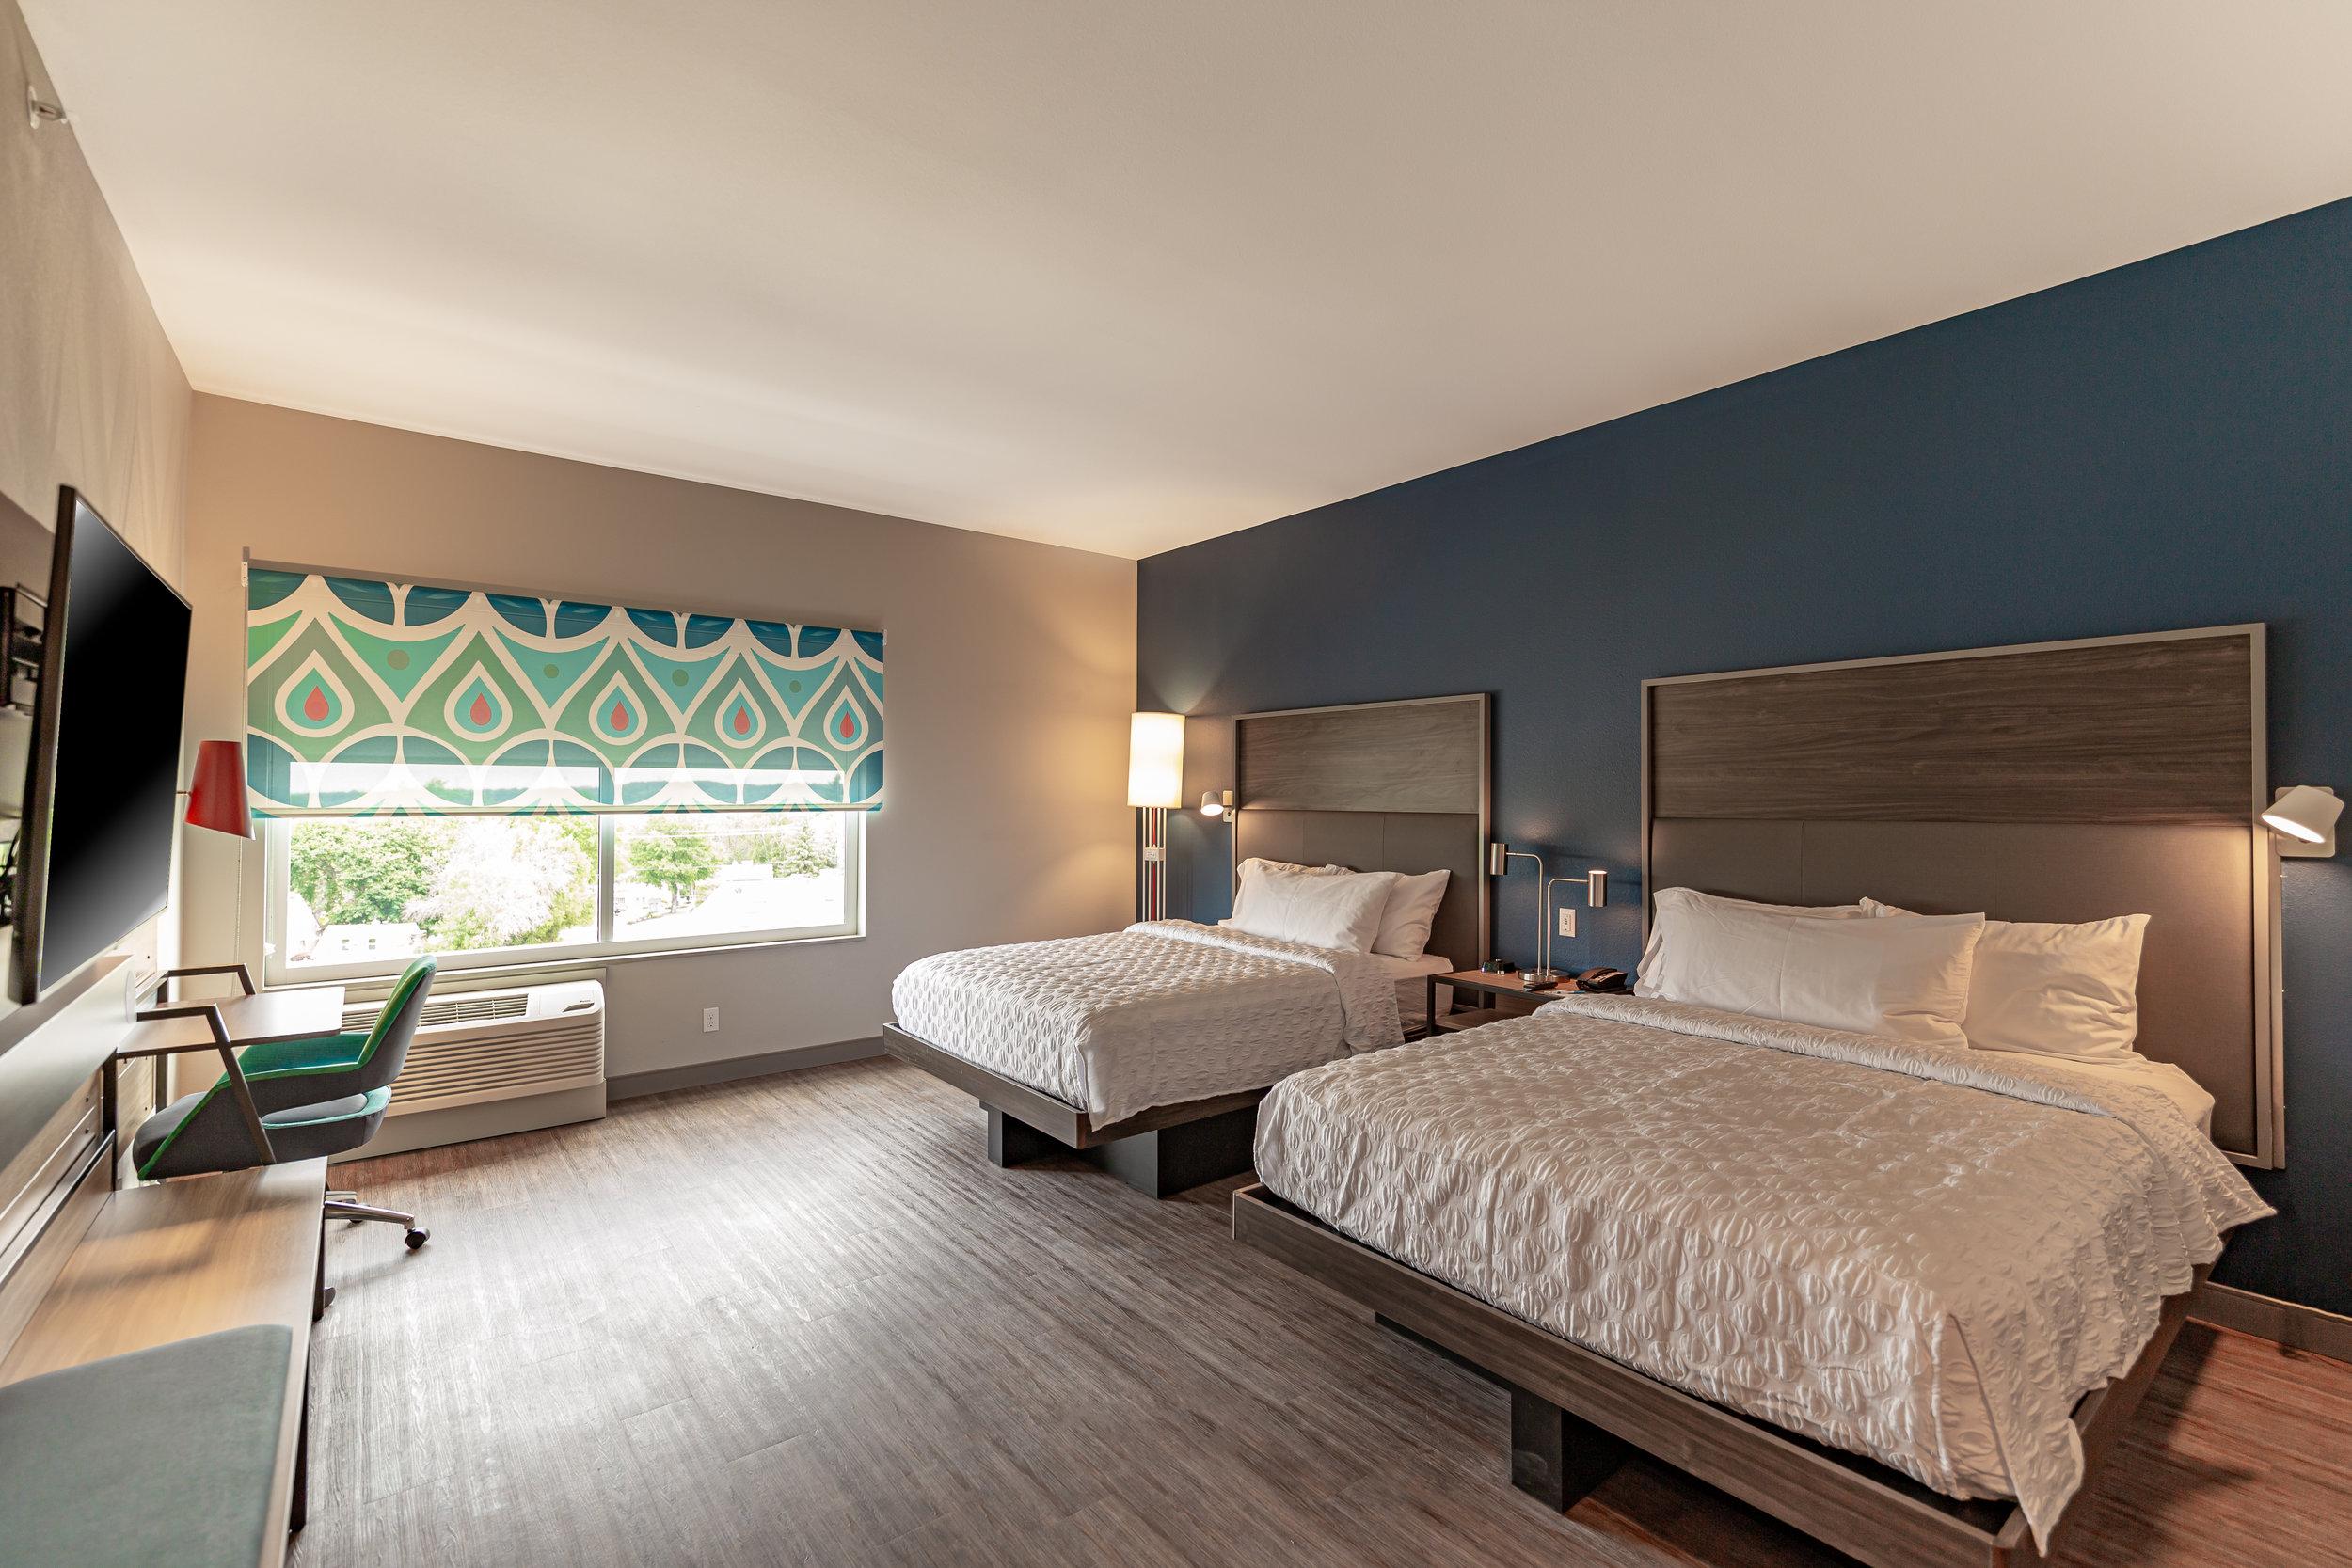 Guest room in Tru by Hilton in Brookfield, WI